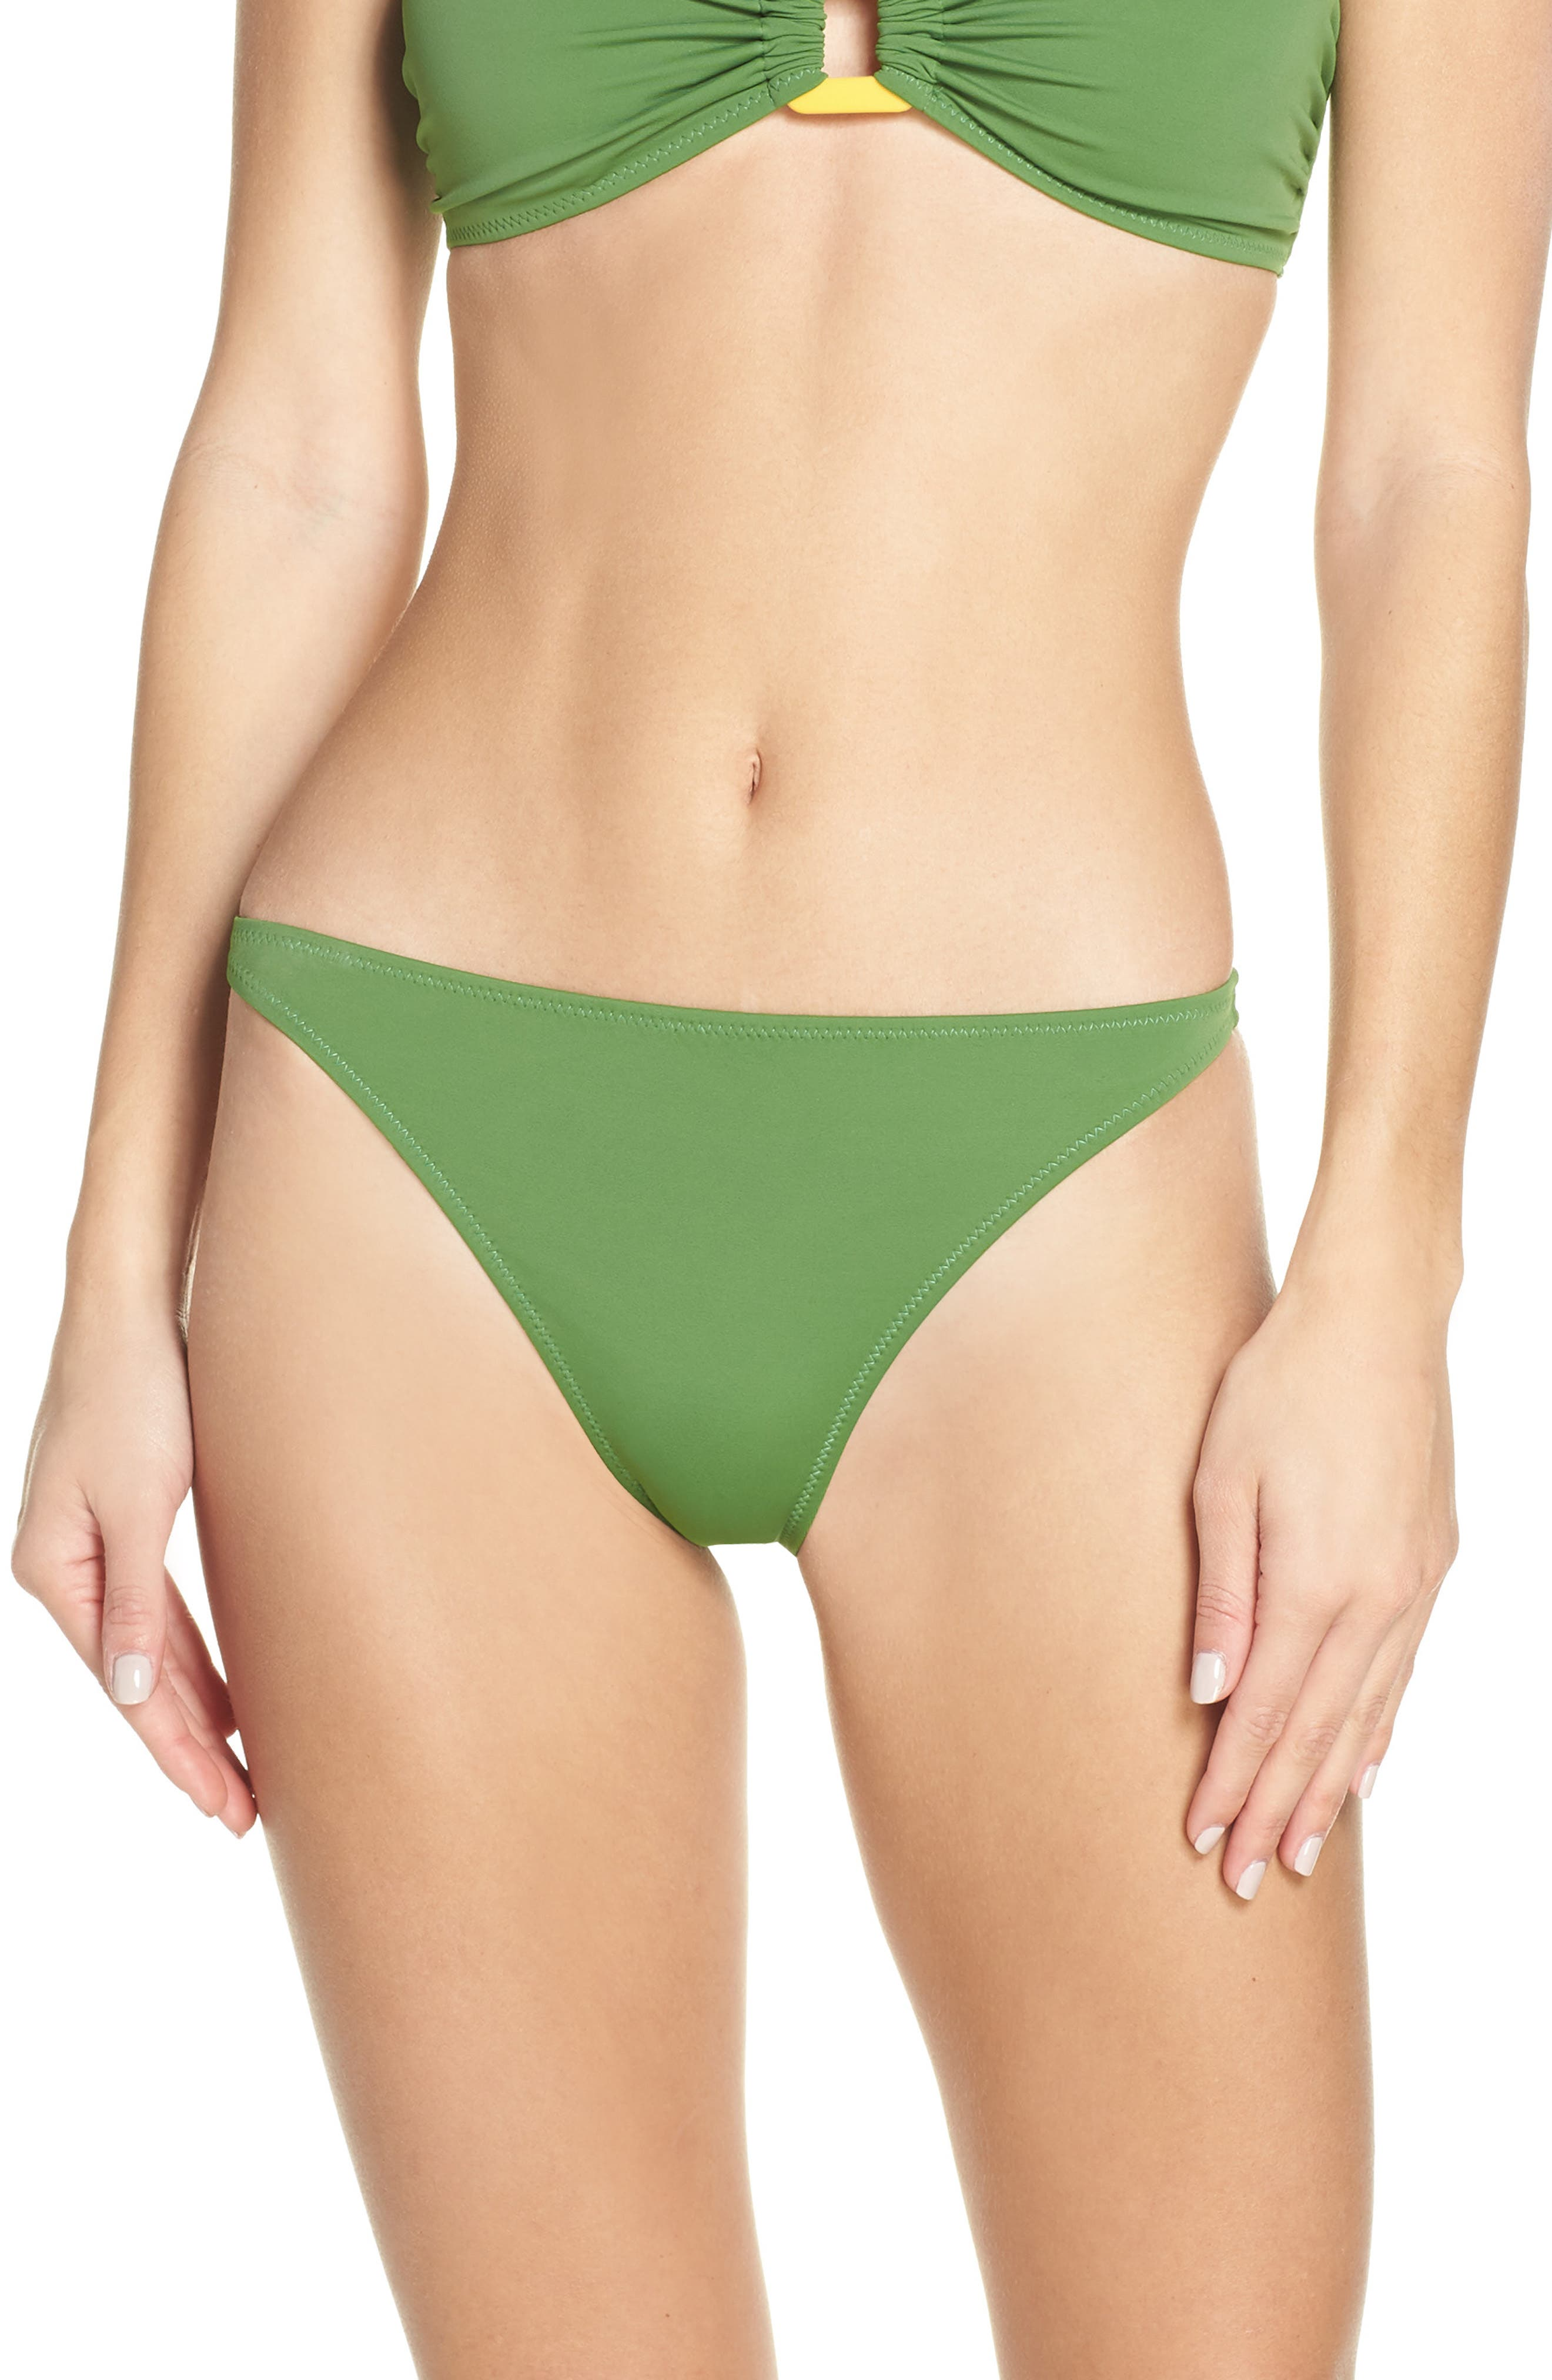 Solid & Striped The Tati Grass High Cut Bikini Bottoms, Green